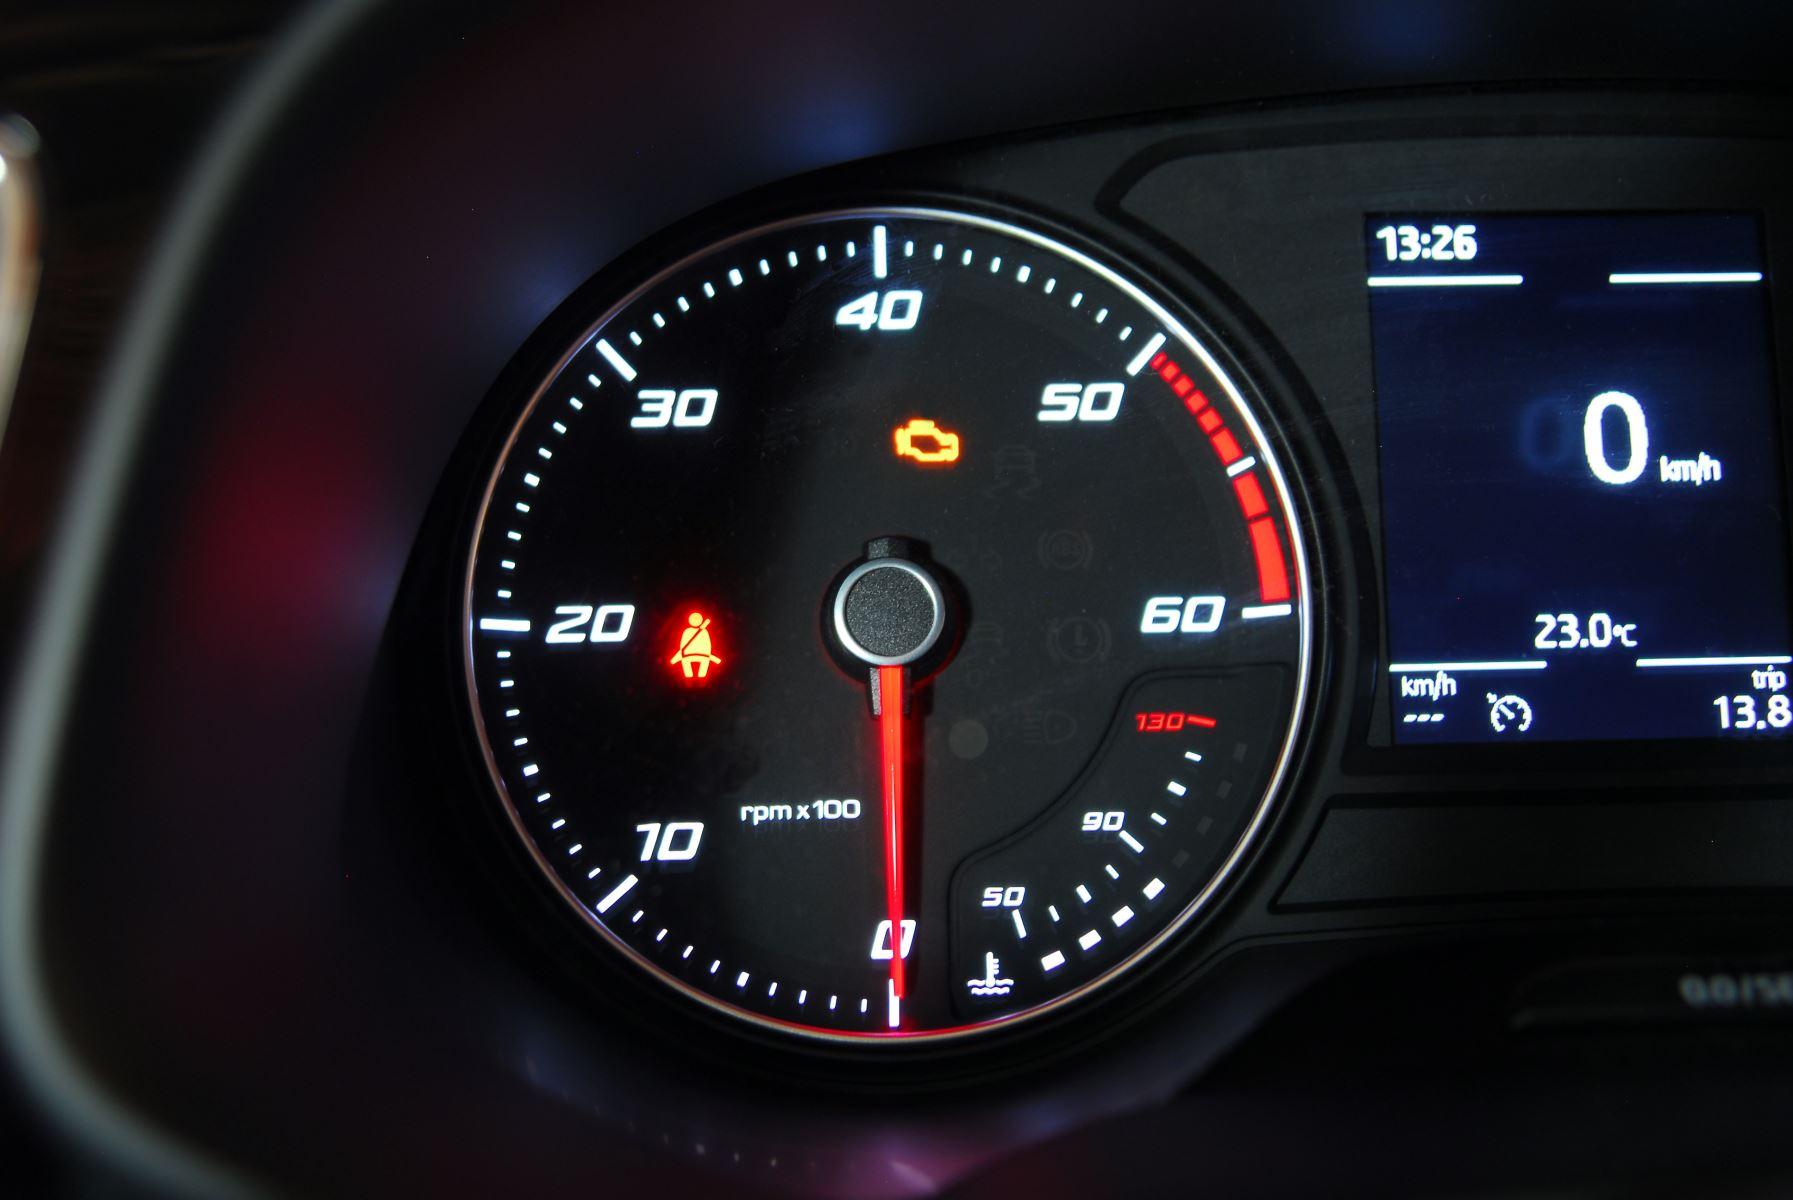 Phil's Pro Auto Service image 2